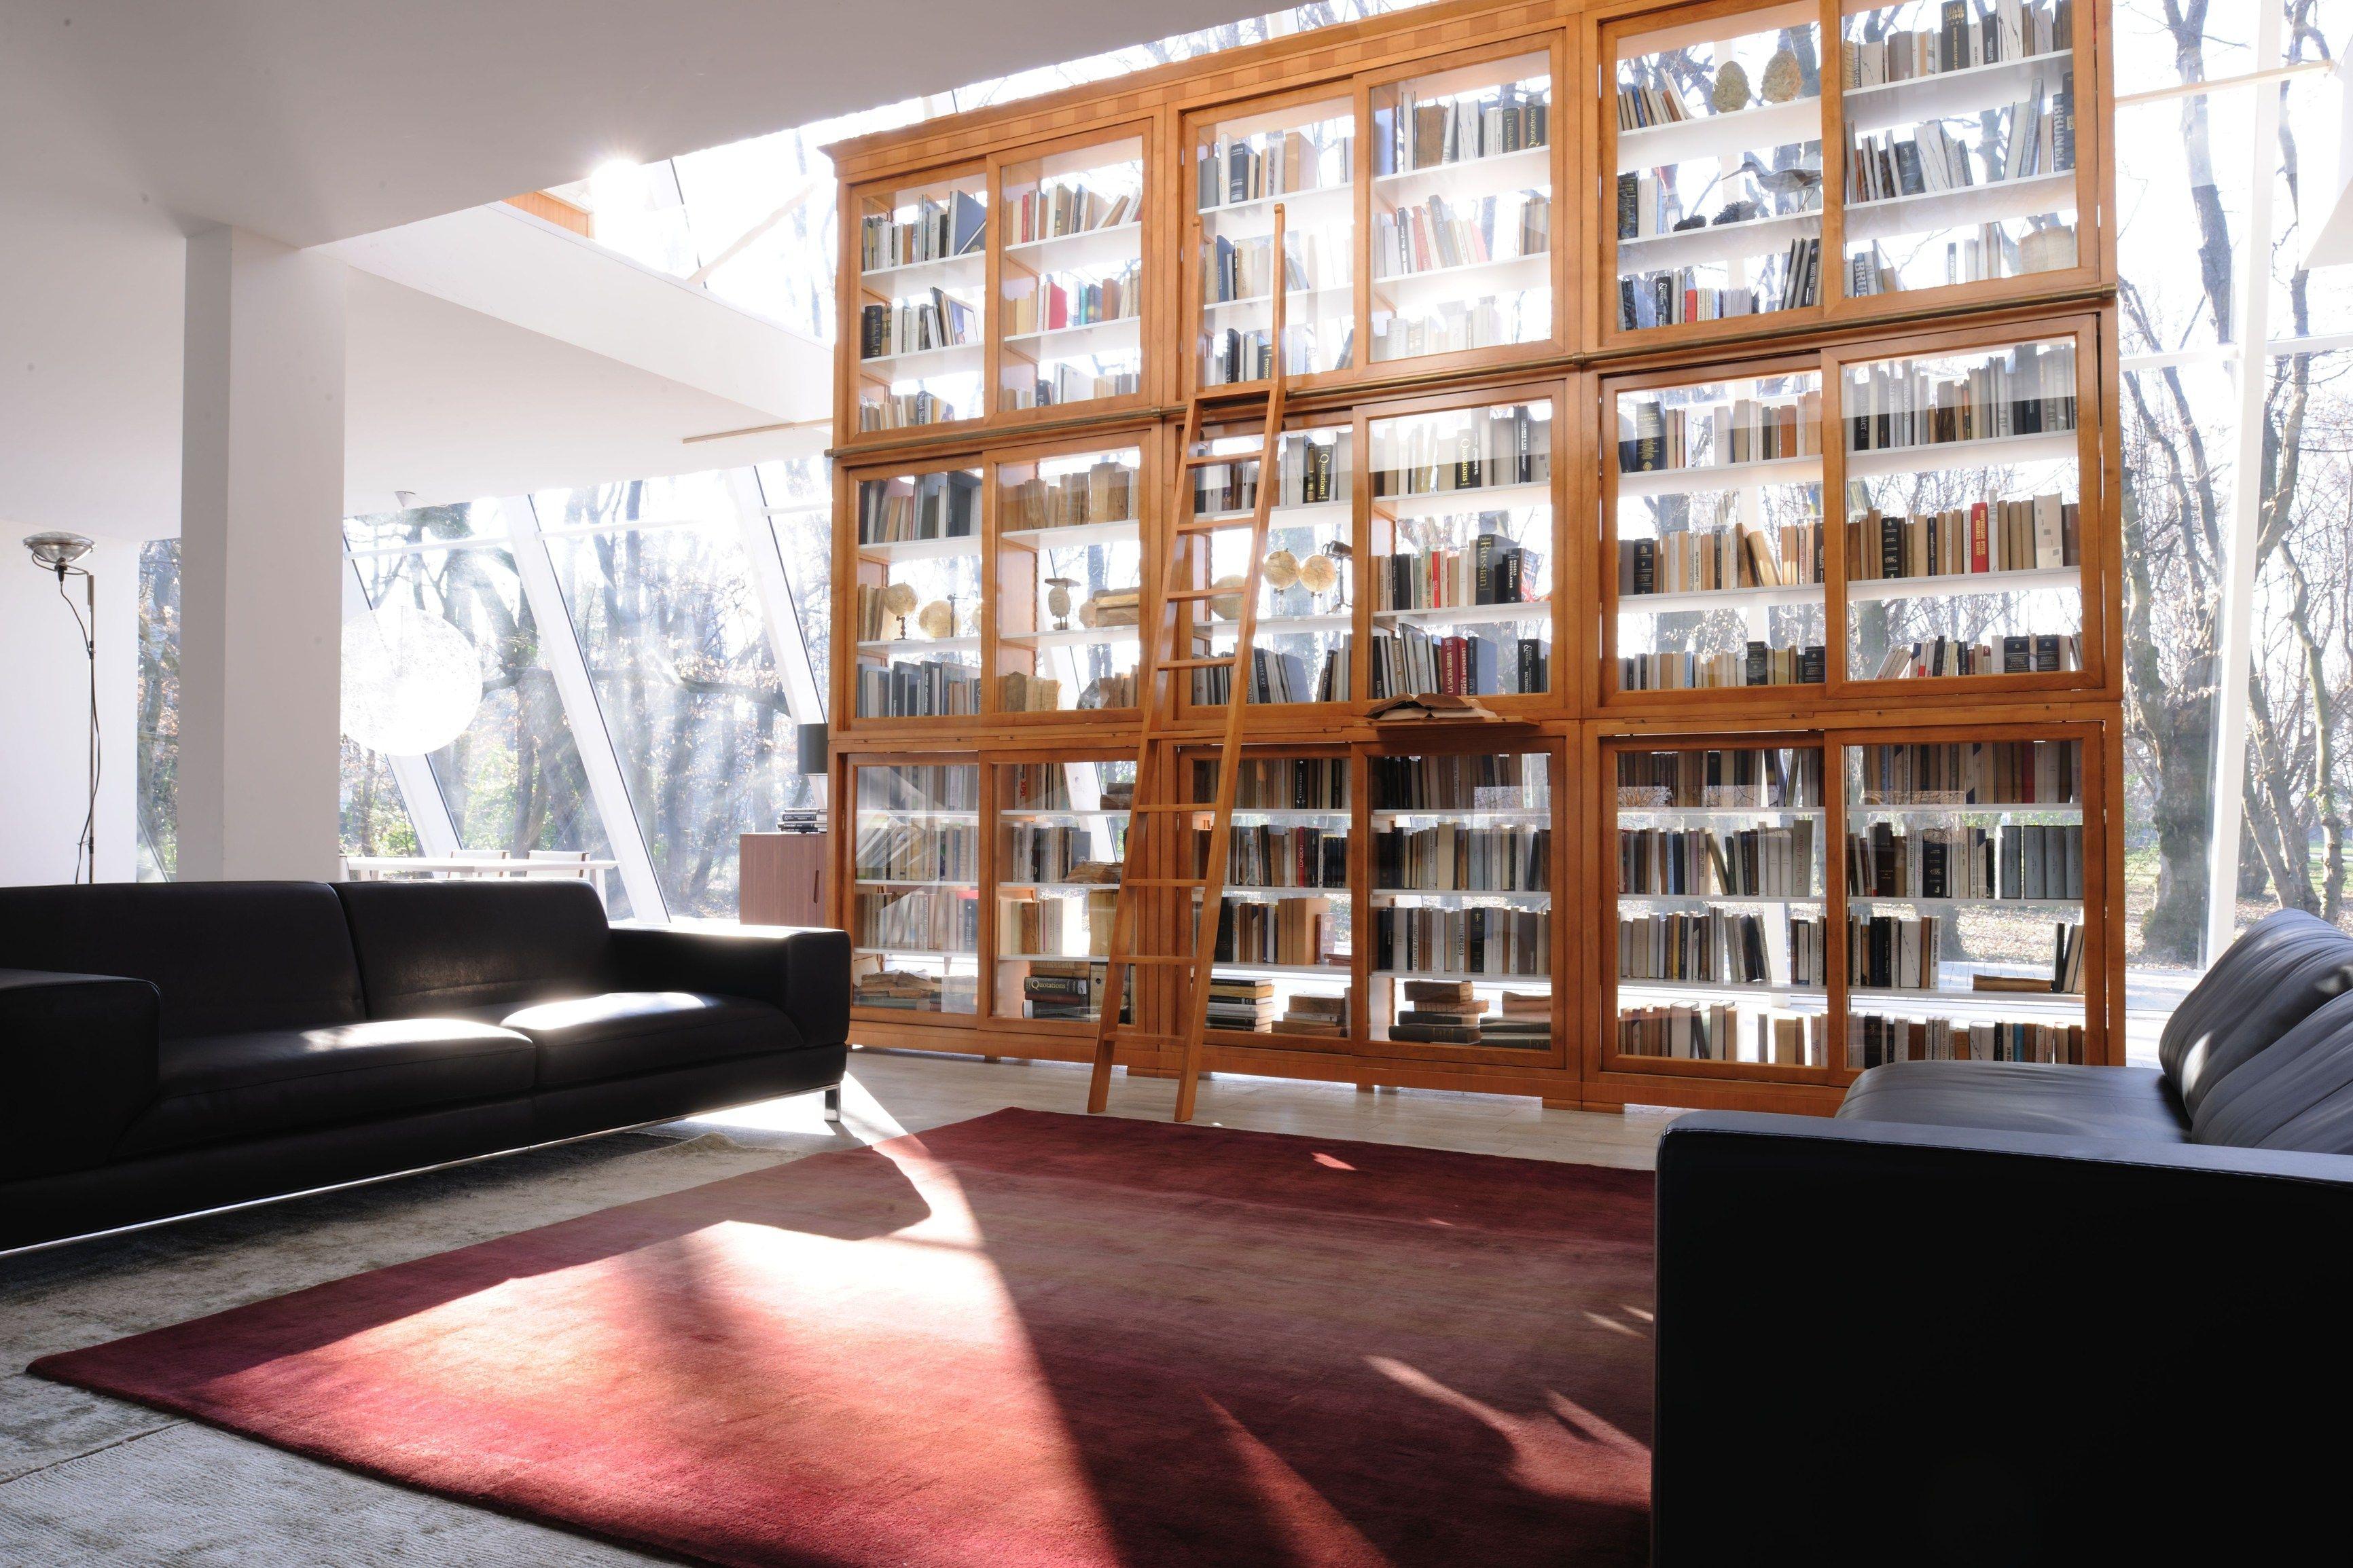 Modulo biedermeier libreria by morelato design centro ricerche maam - Morelato mobili ...